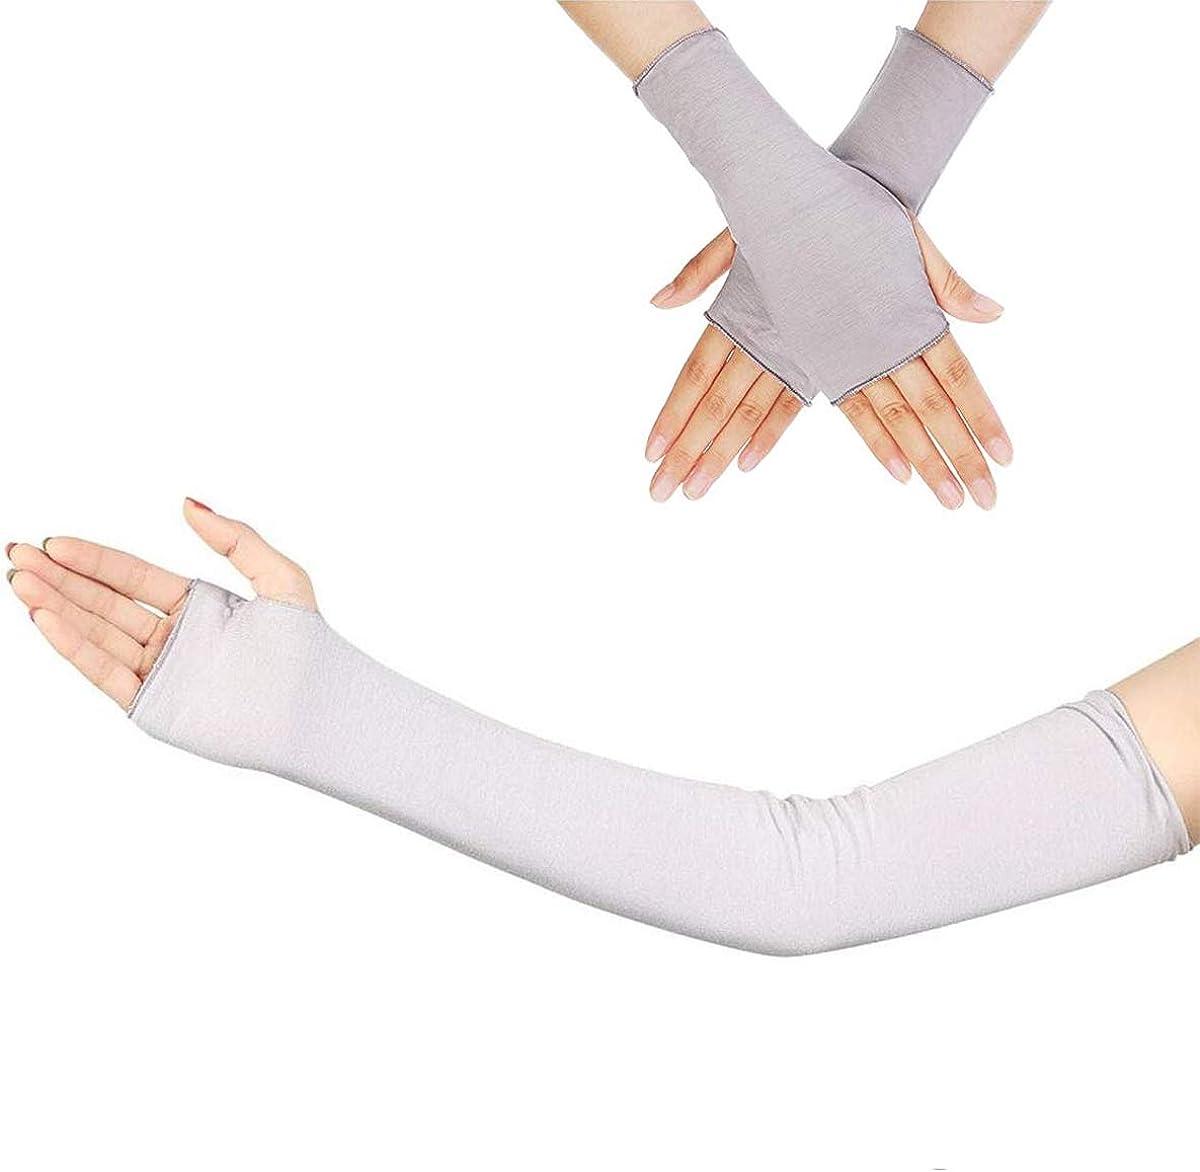 Cityelf Anti UV Arm Sch/ützer Warm bleiben /Ärmel handschuhe Damen Armstulpen Sonnenschutz Handschuhe f/ür Fahren